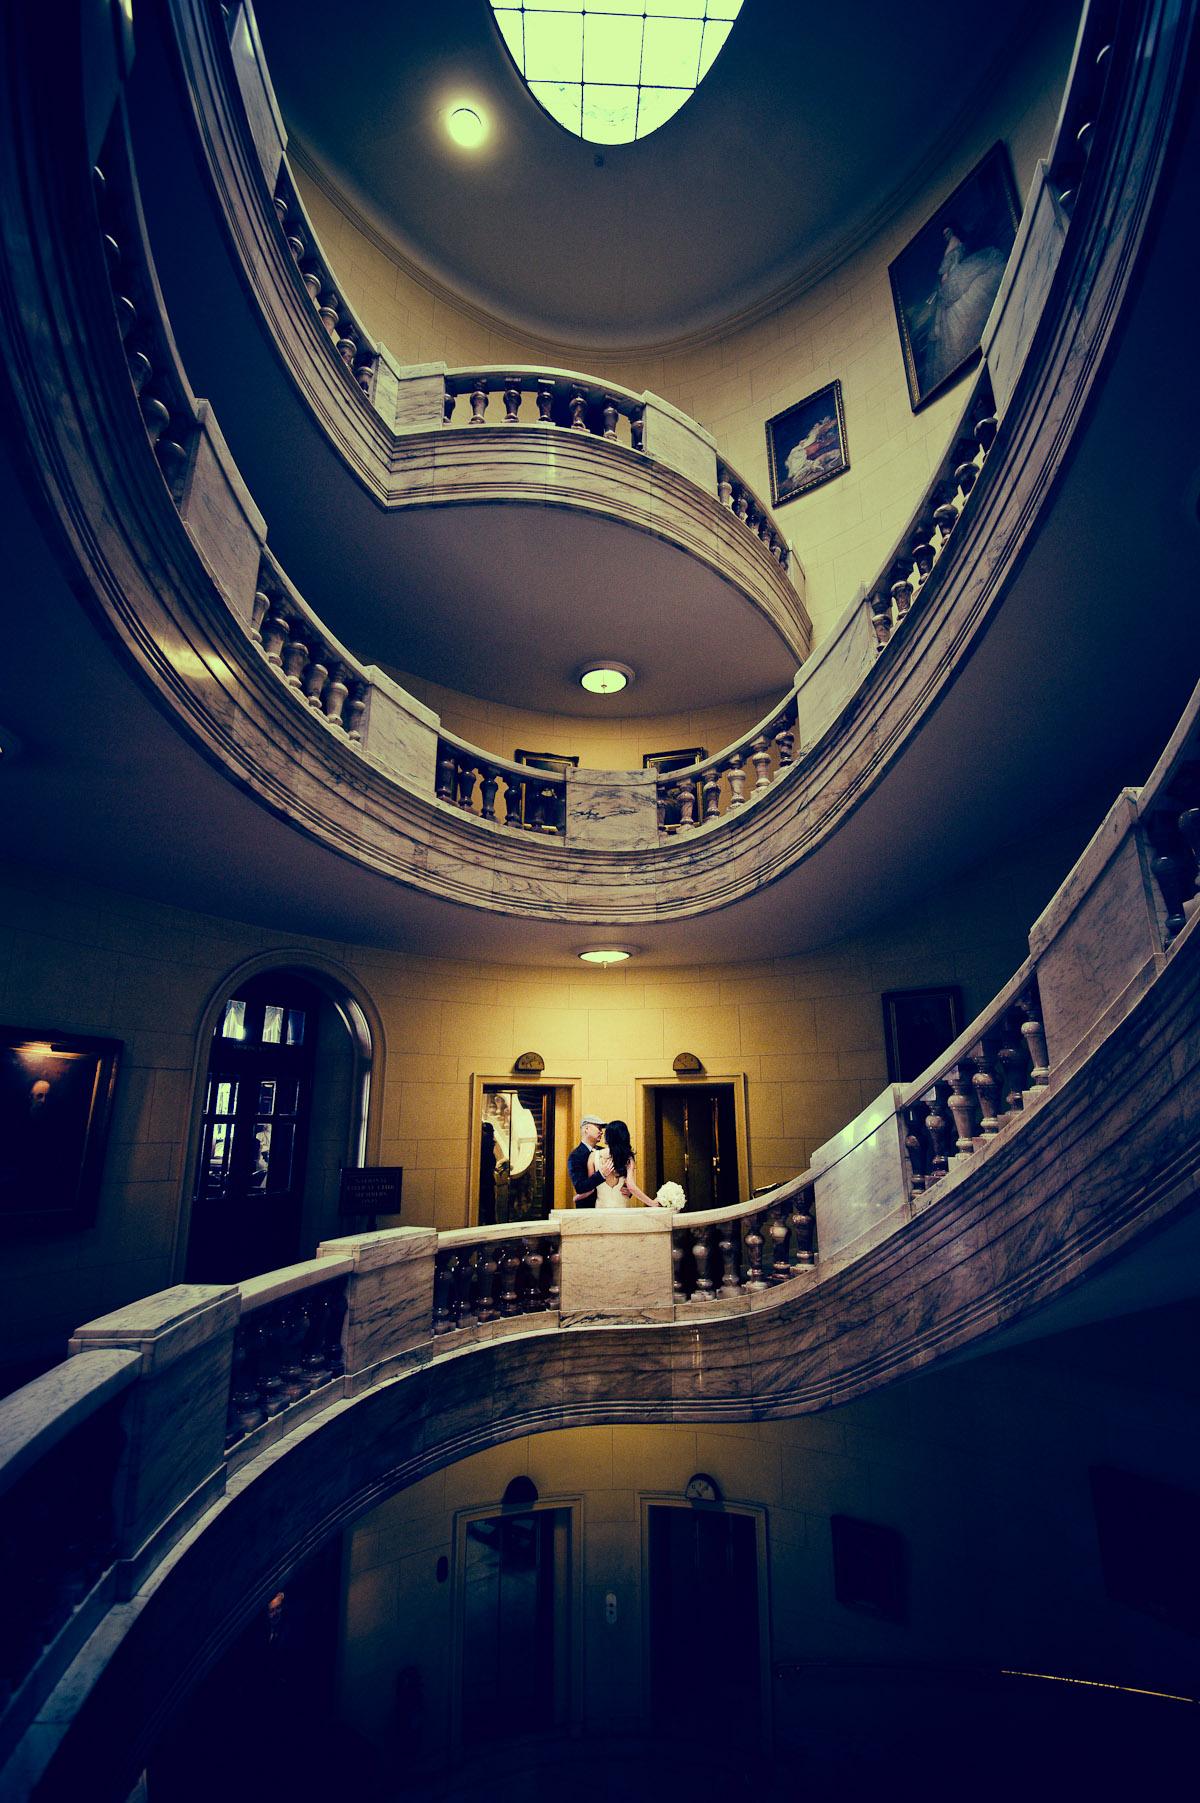 Royal Horseguards wedding venue